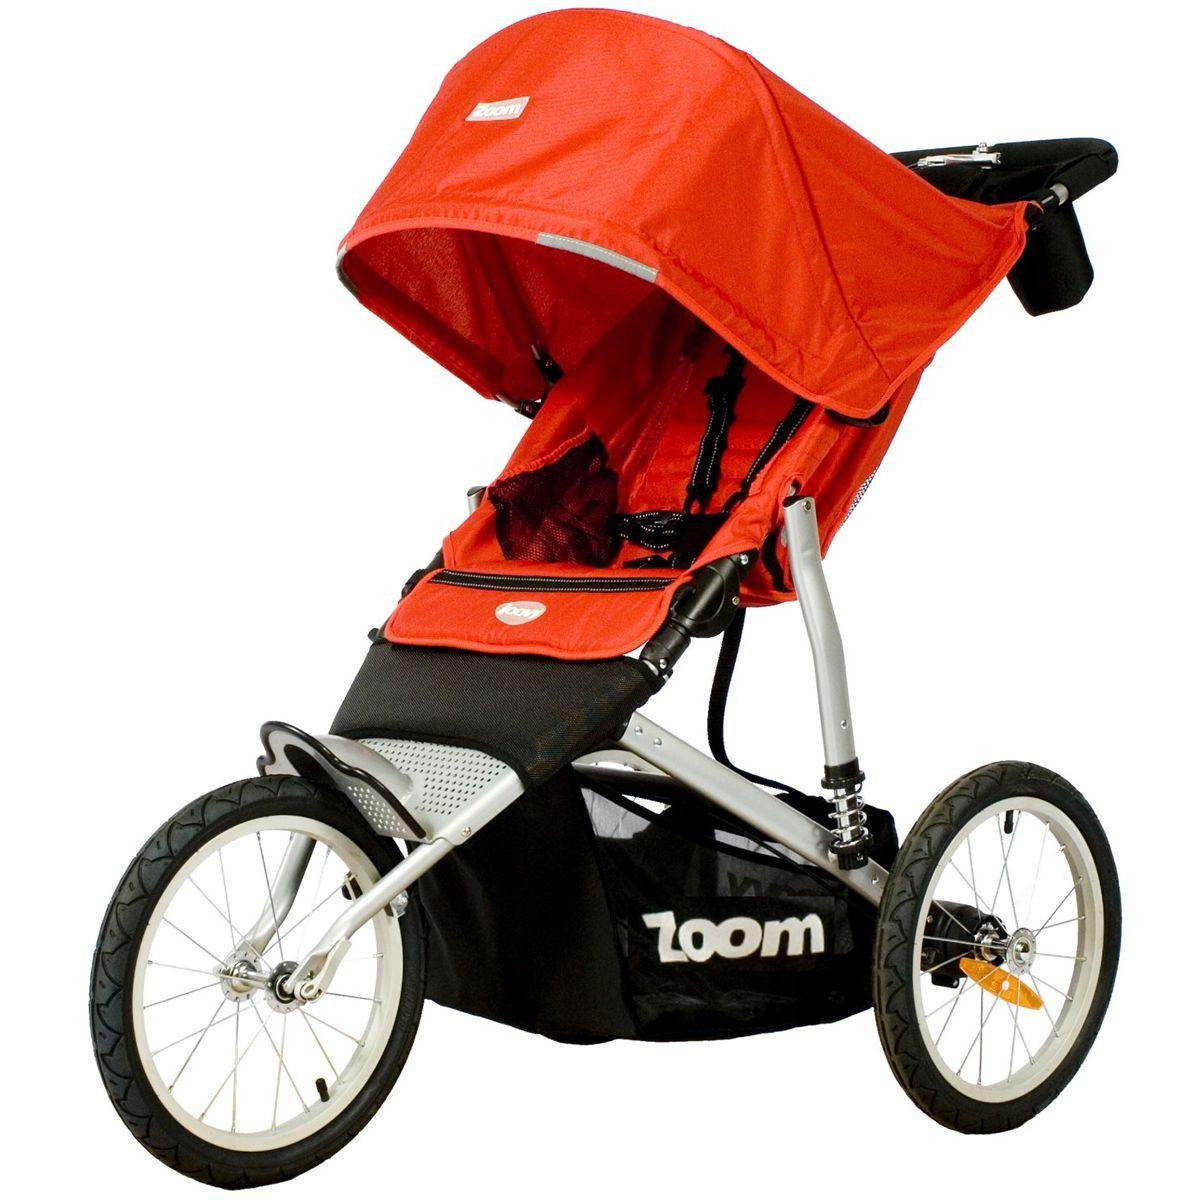 Joovy Zoom Ats Jogging Stroller In Red Baby Strollers Jogging